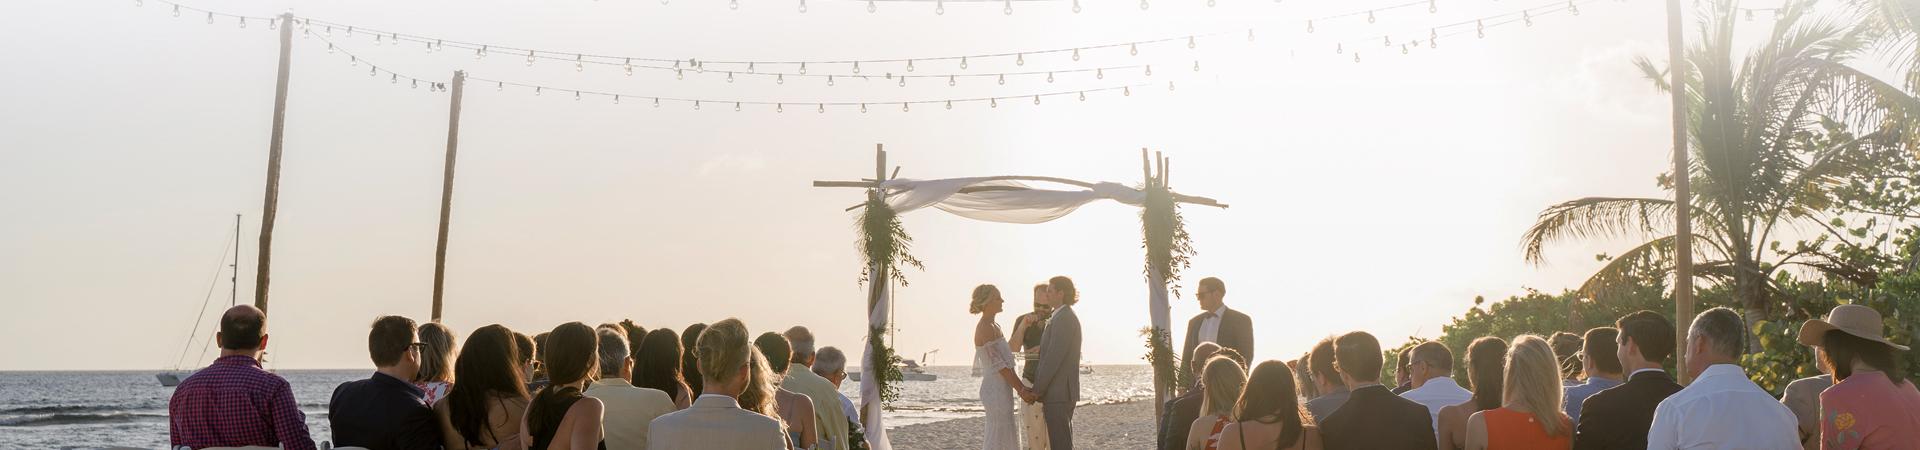 Wedding Inquiry Banner - The Wharf Restaurant & Bar